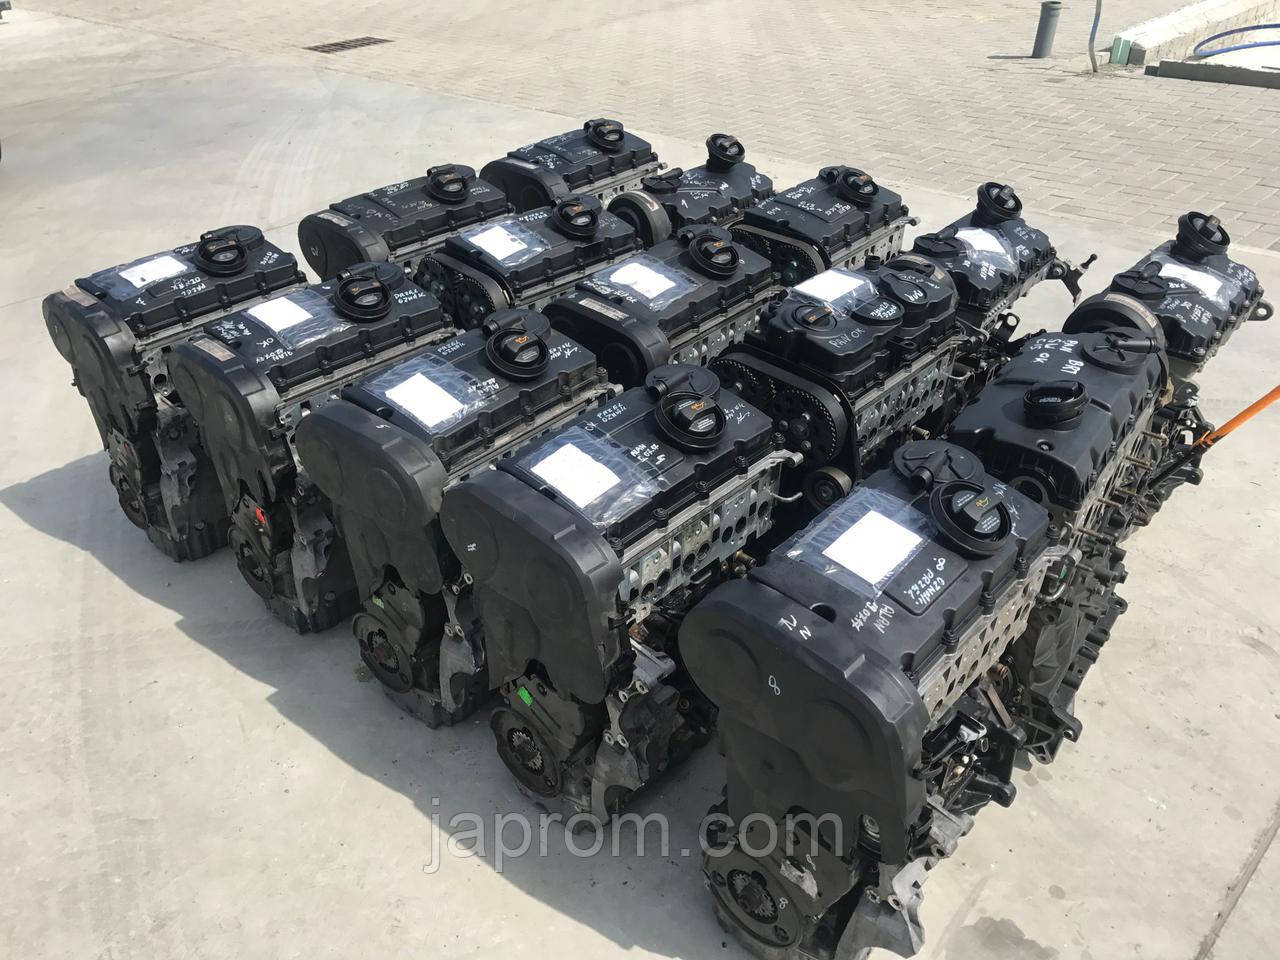 Мотор (Двигатель) Audi Volkswagen SKODA 2.0 TDI 16V 140 KM BKD BKP